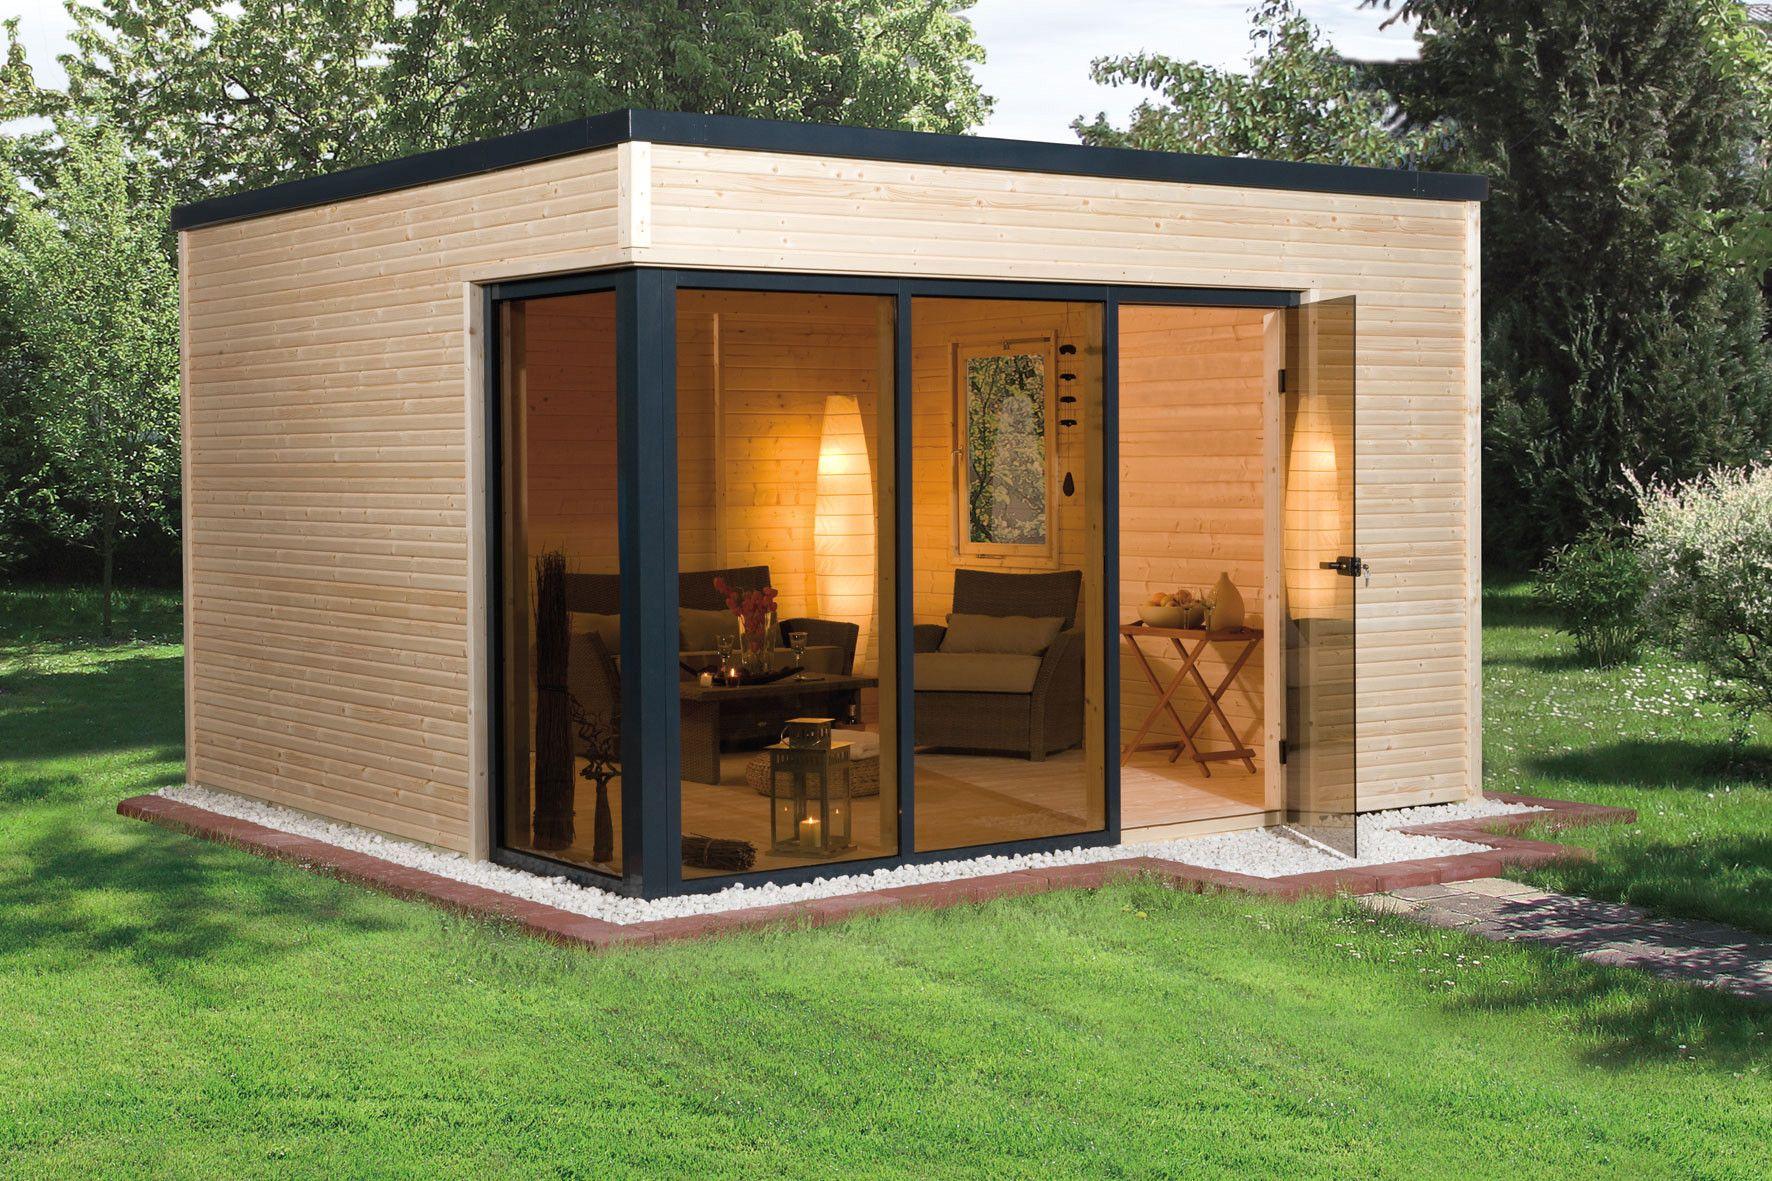 Ytong Gartenhaus Bausatz Bungalow design, Studio shed